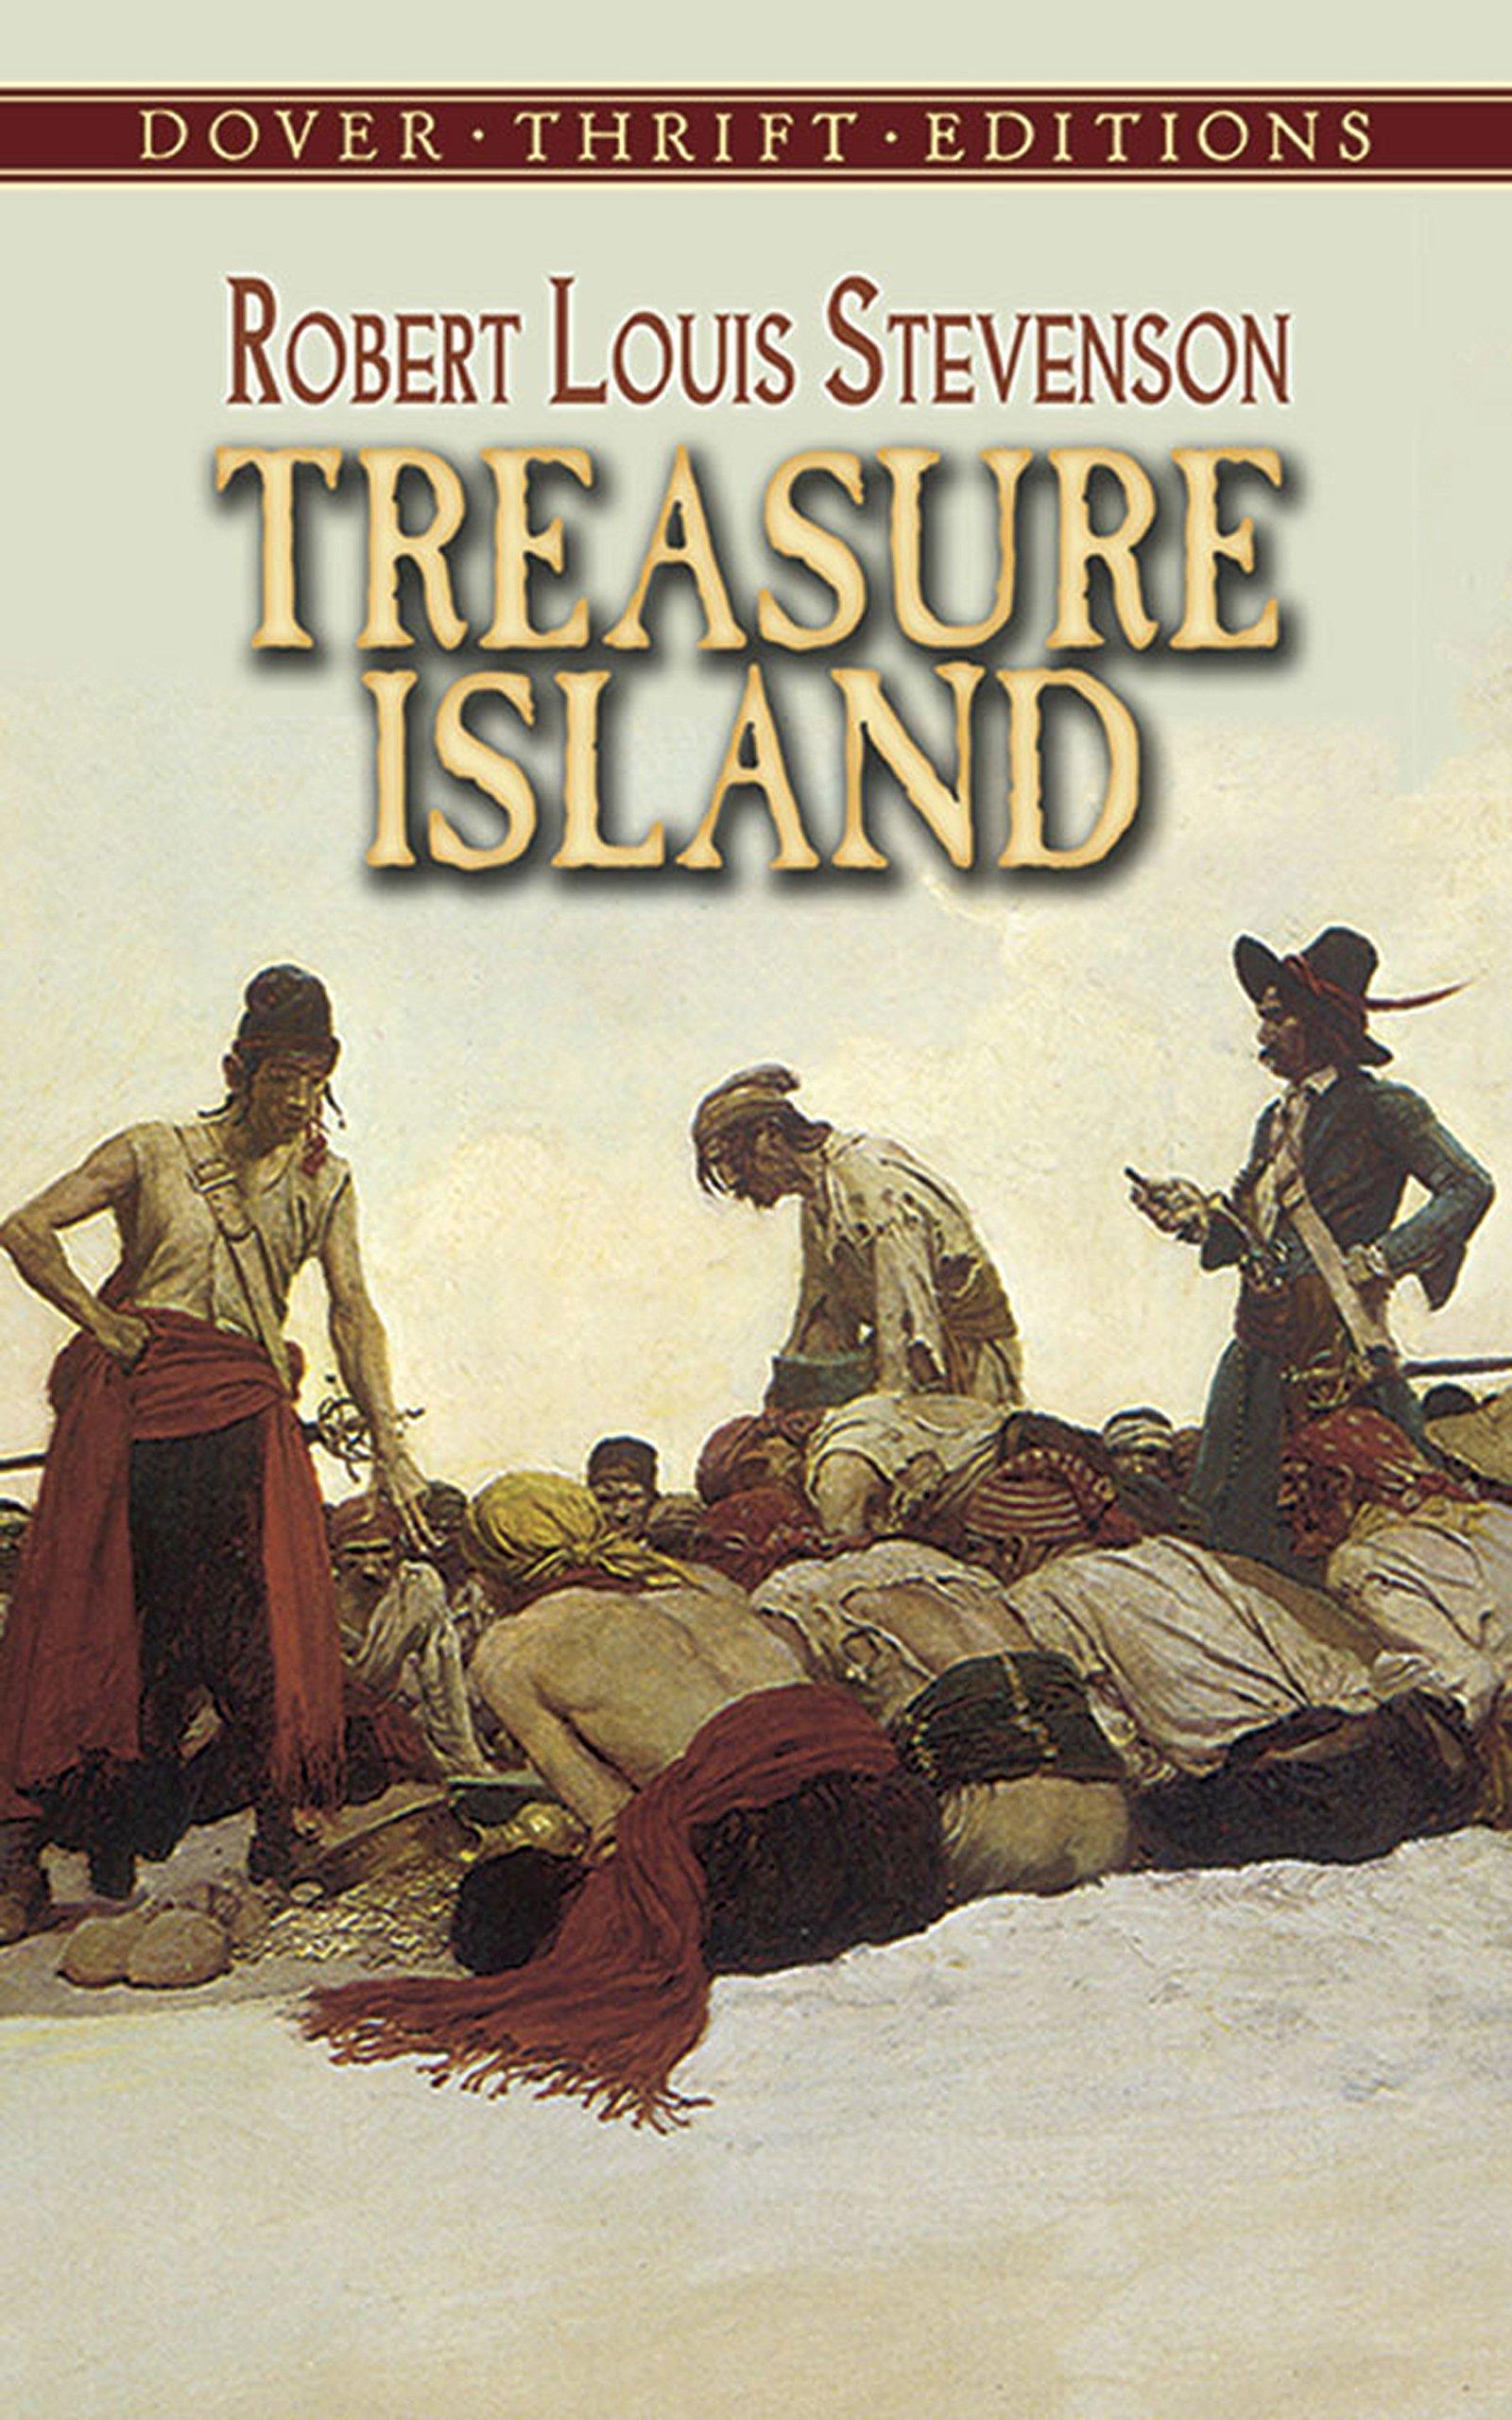 TREASURE ISLAND - Dover Thrift Editions